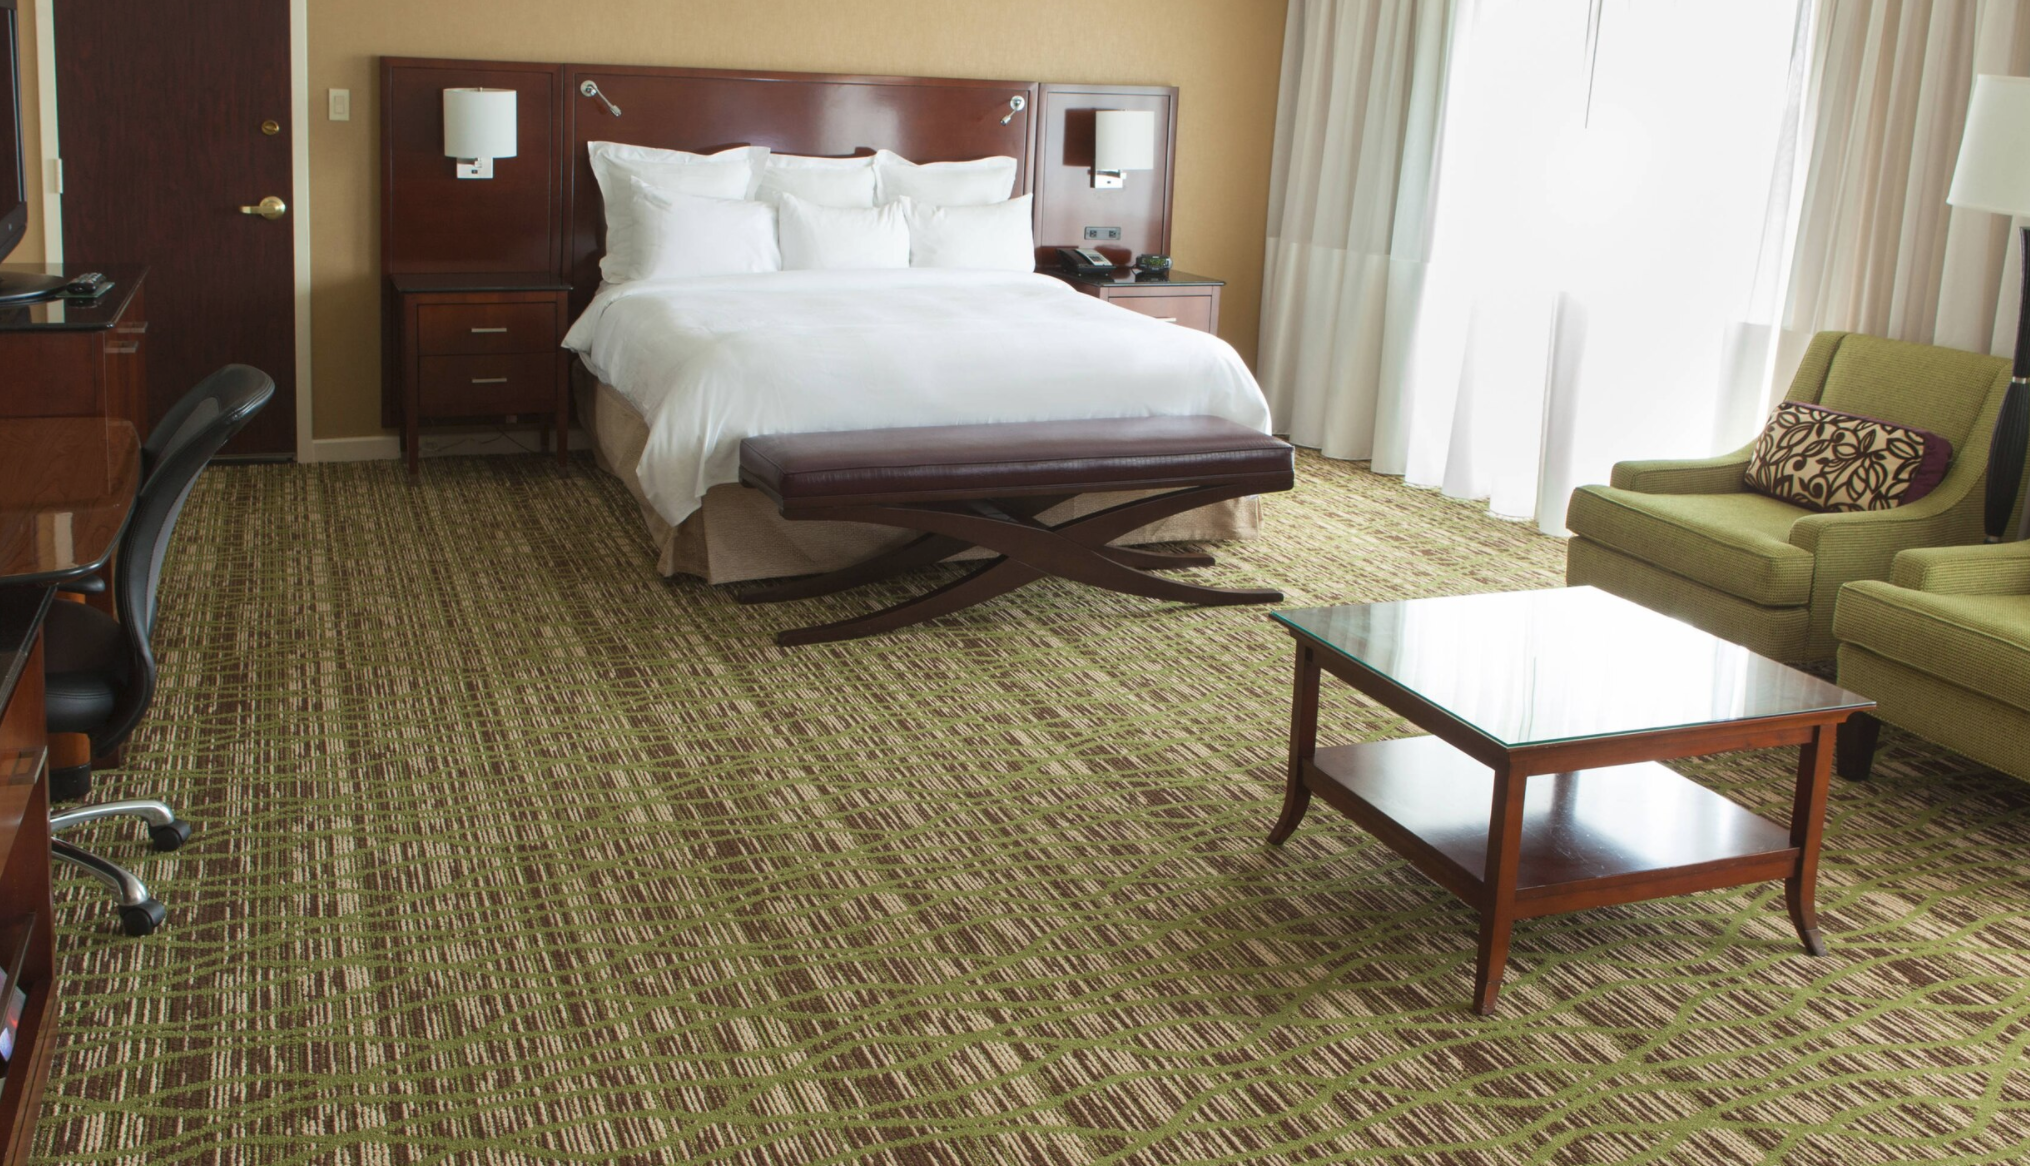 https://www.hotelsbyday.com/_data/default-hotel_image/4/21207/screenshot-2020-08-20-at-7-40-31-pm.png